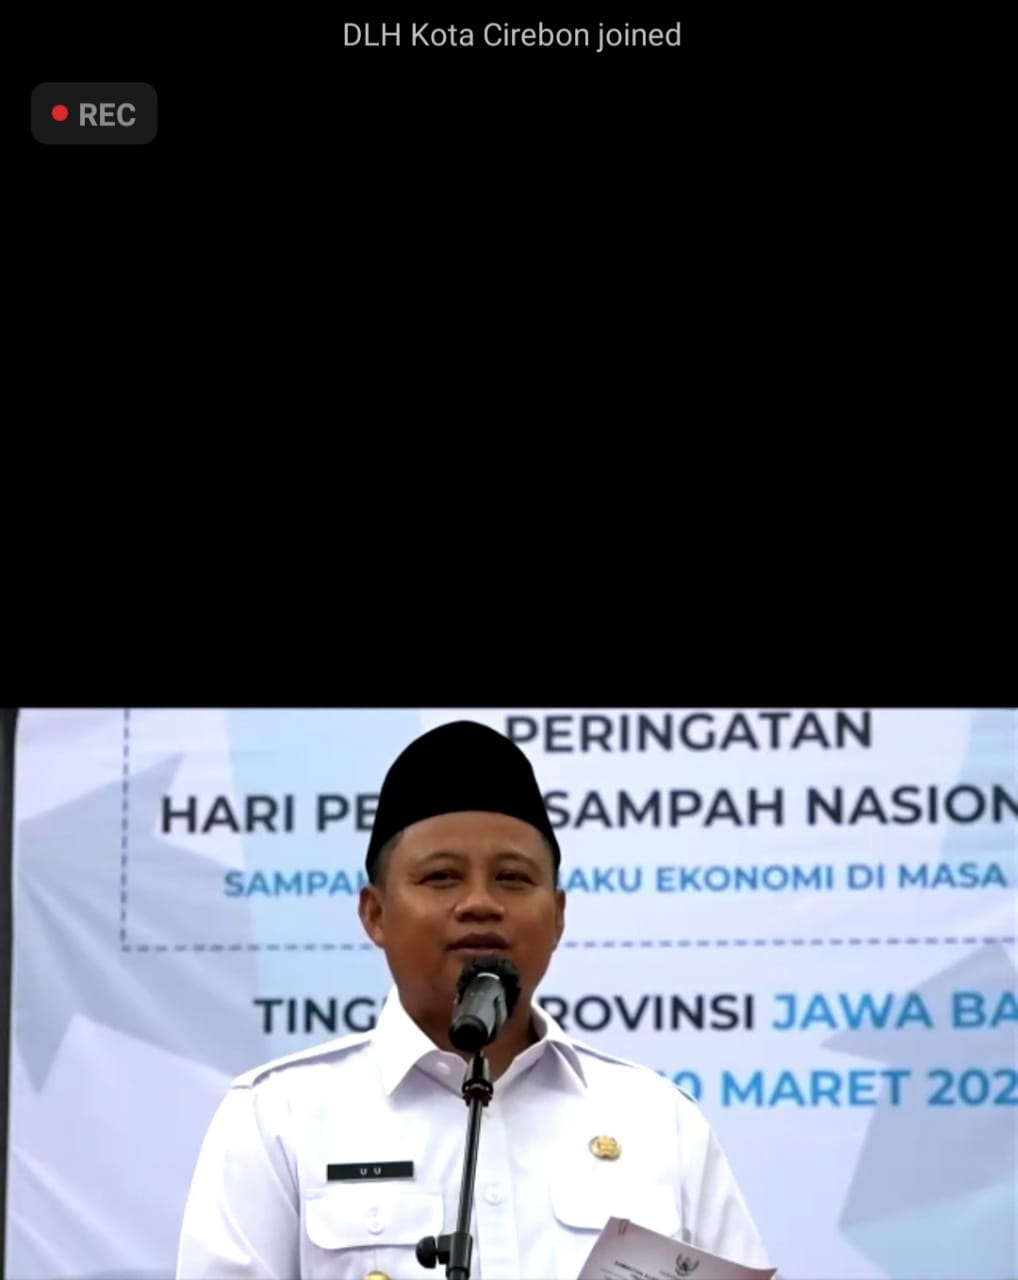 HPSN 2021, Wagub Jabar : Sampah itu Uang - Jurnal Bandung